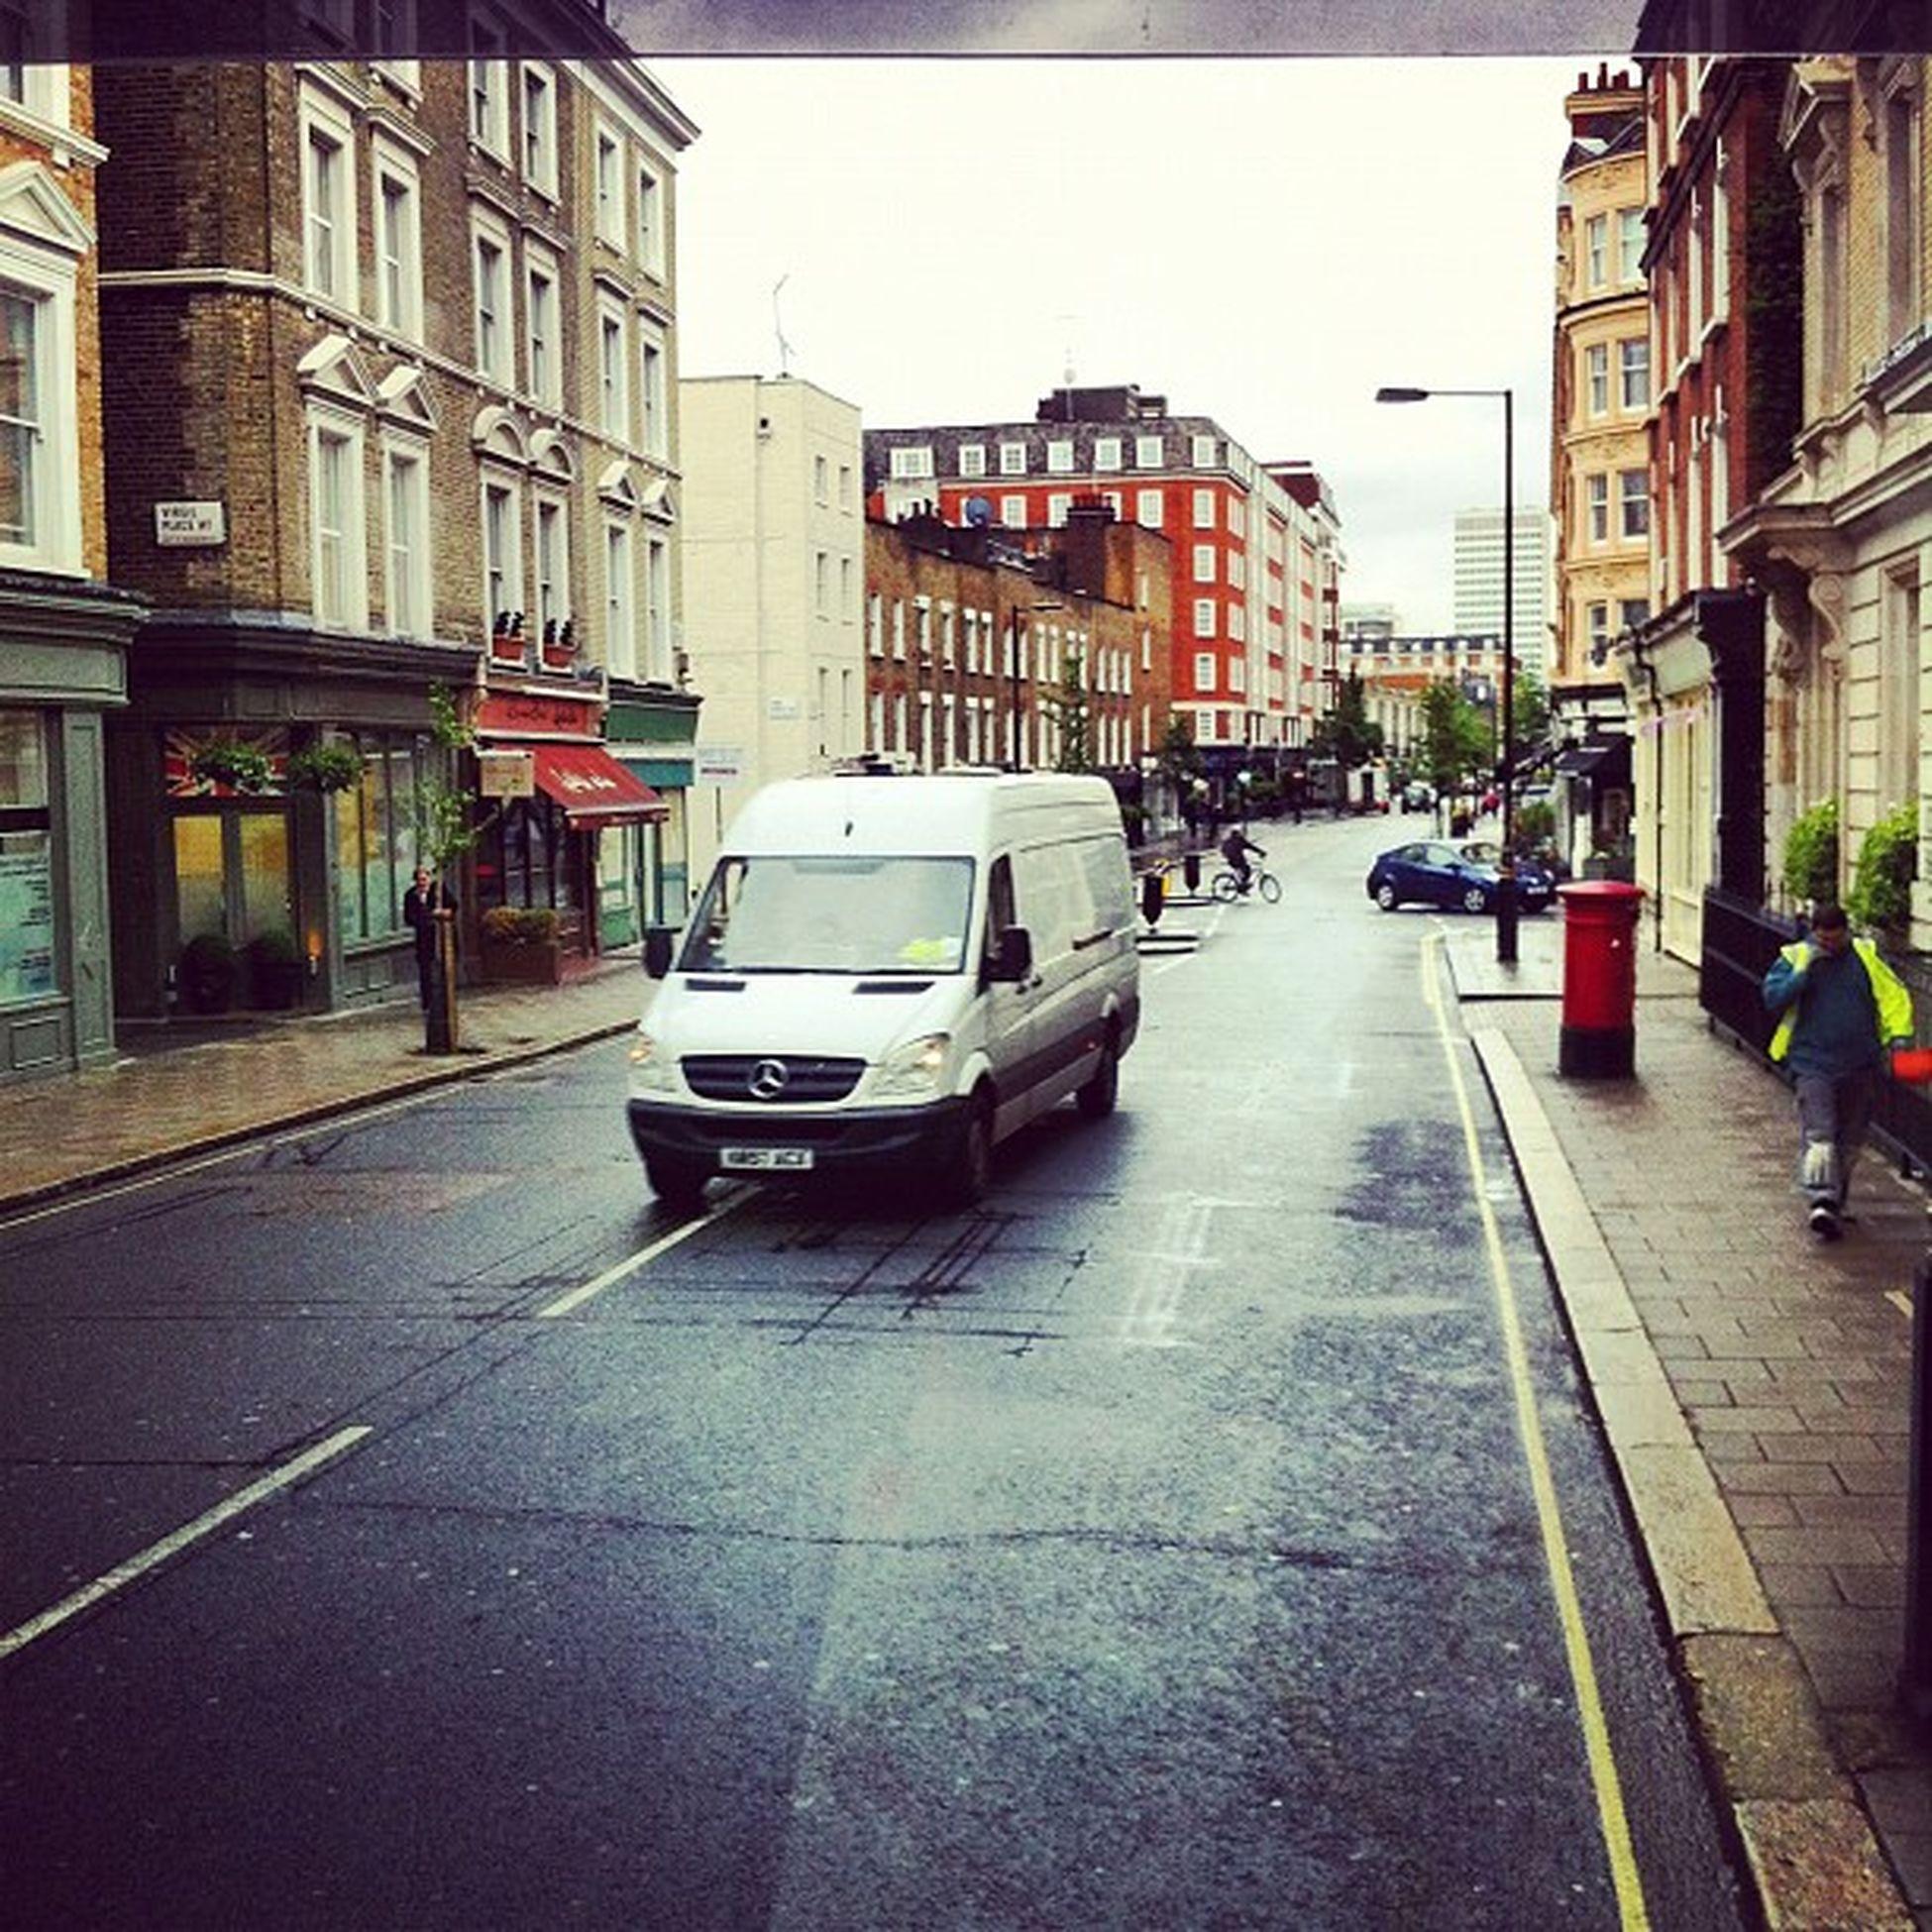 London Seymourplacelondon Uk Busy goingtogetaticket